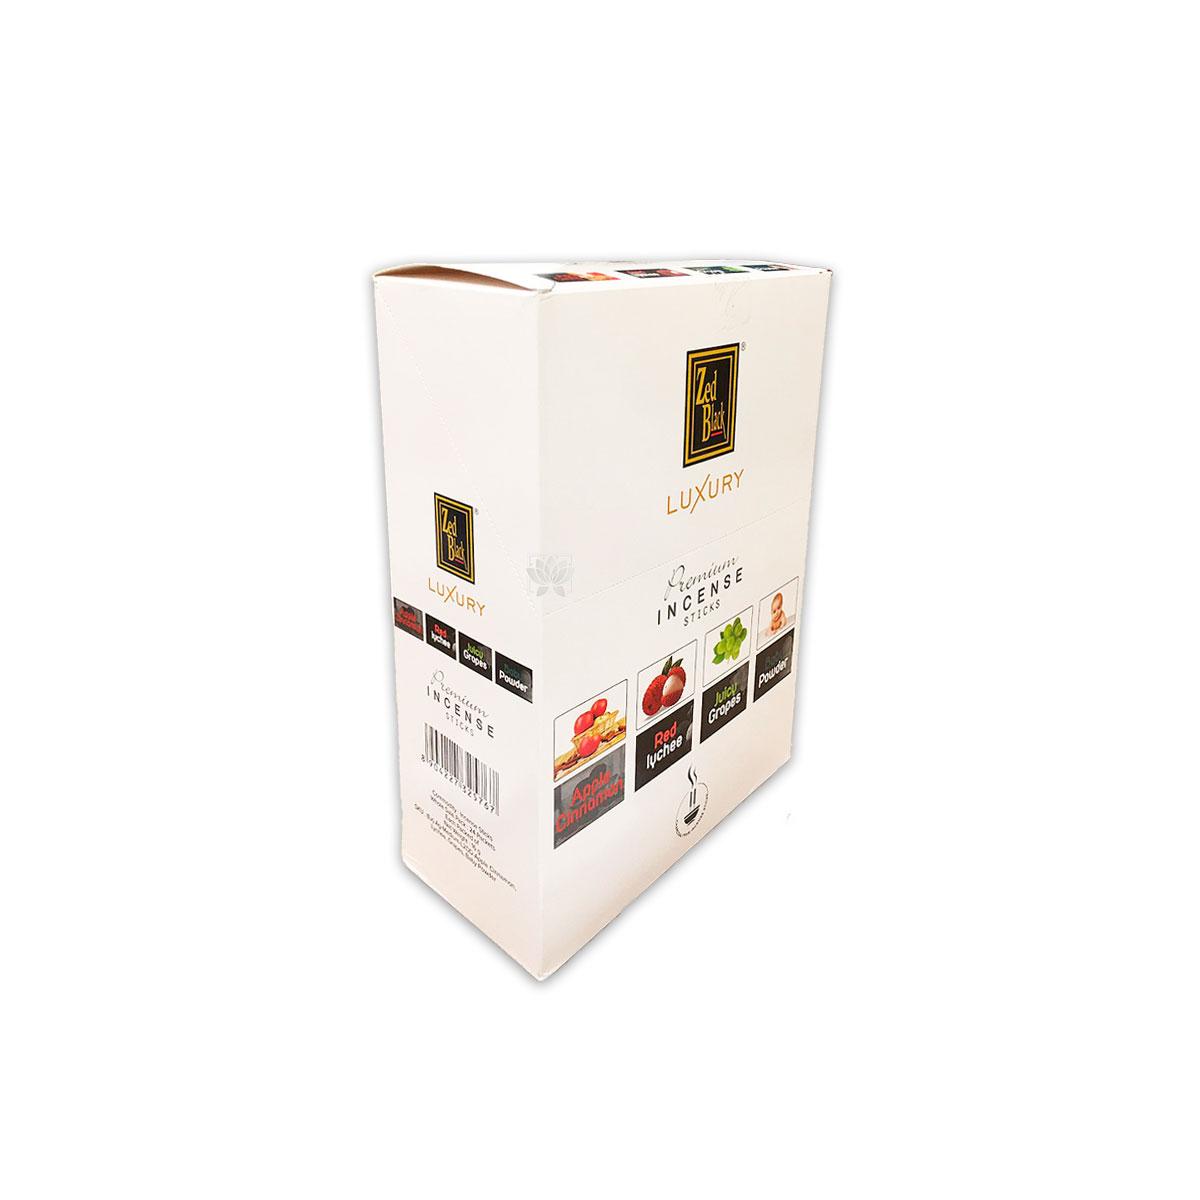 Incienso Zed Black Luxury Premium Exotic Mix